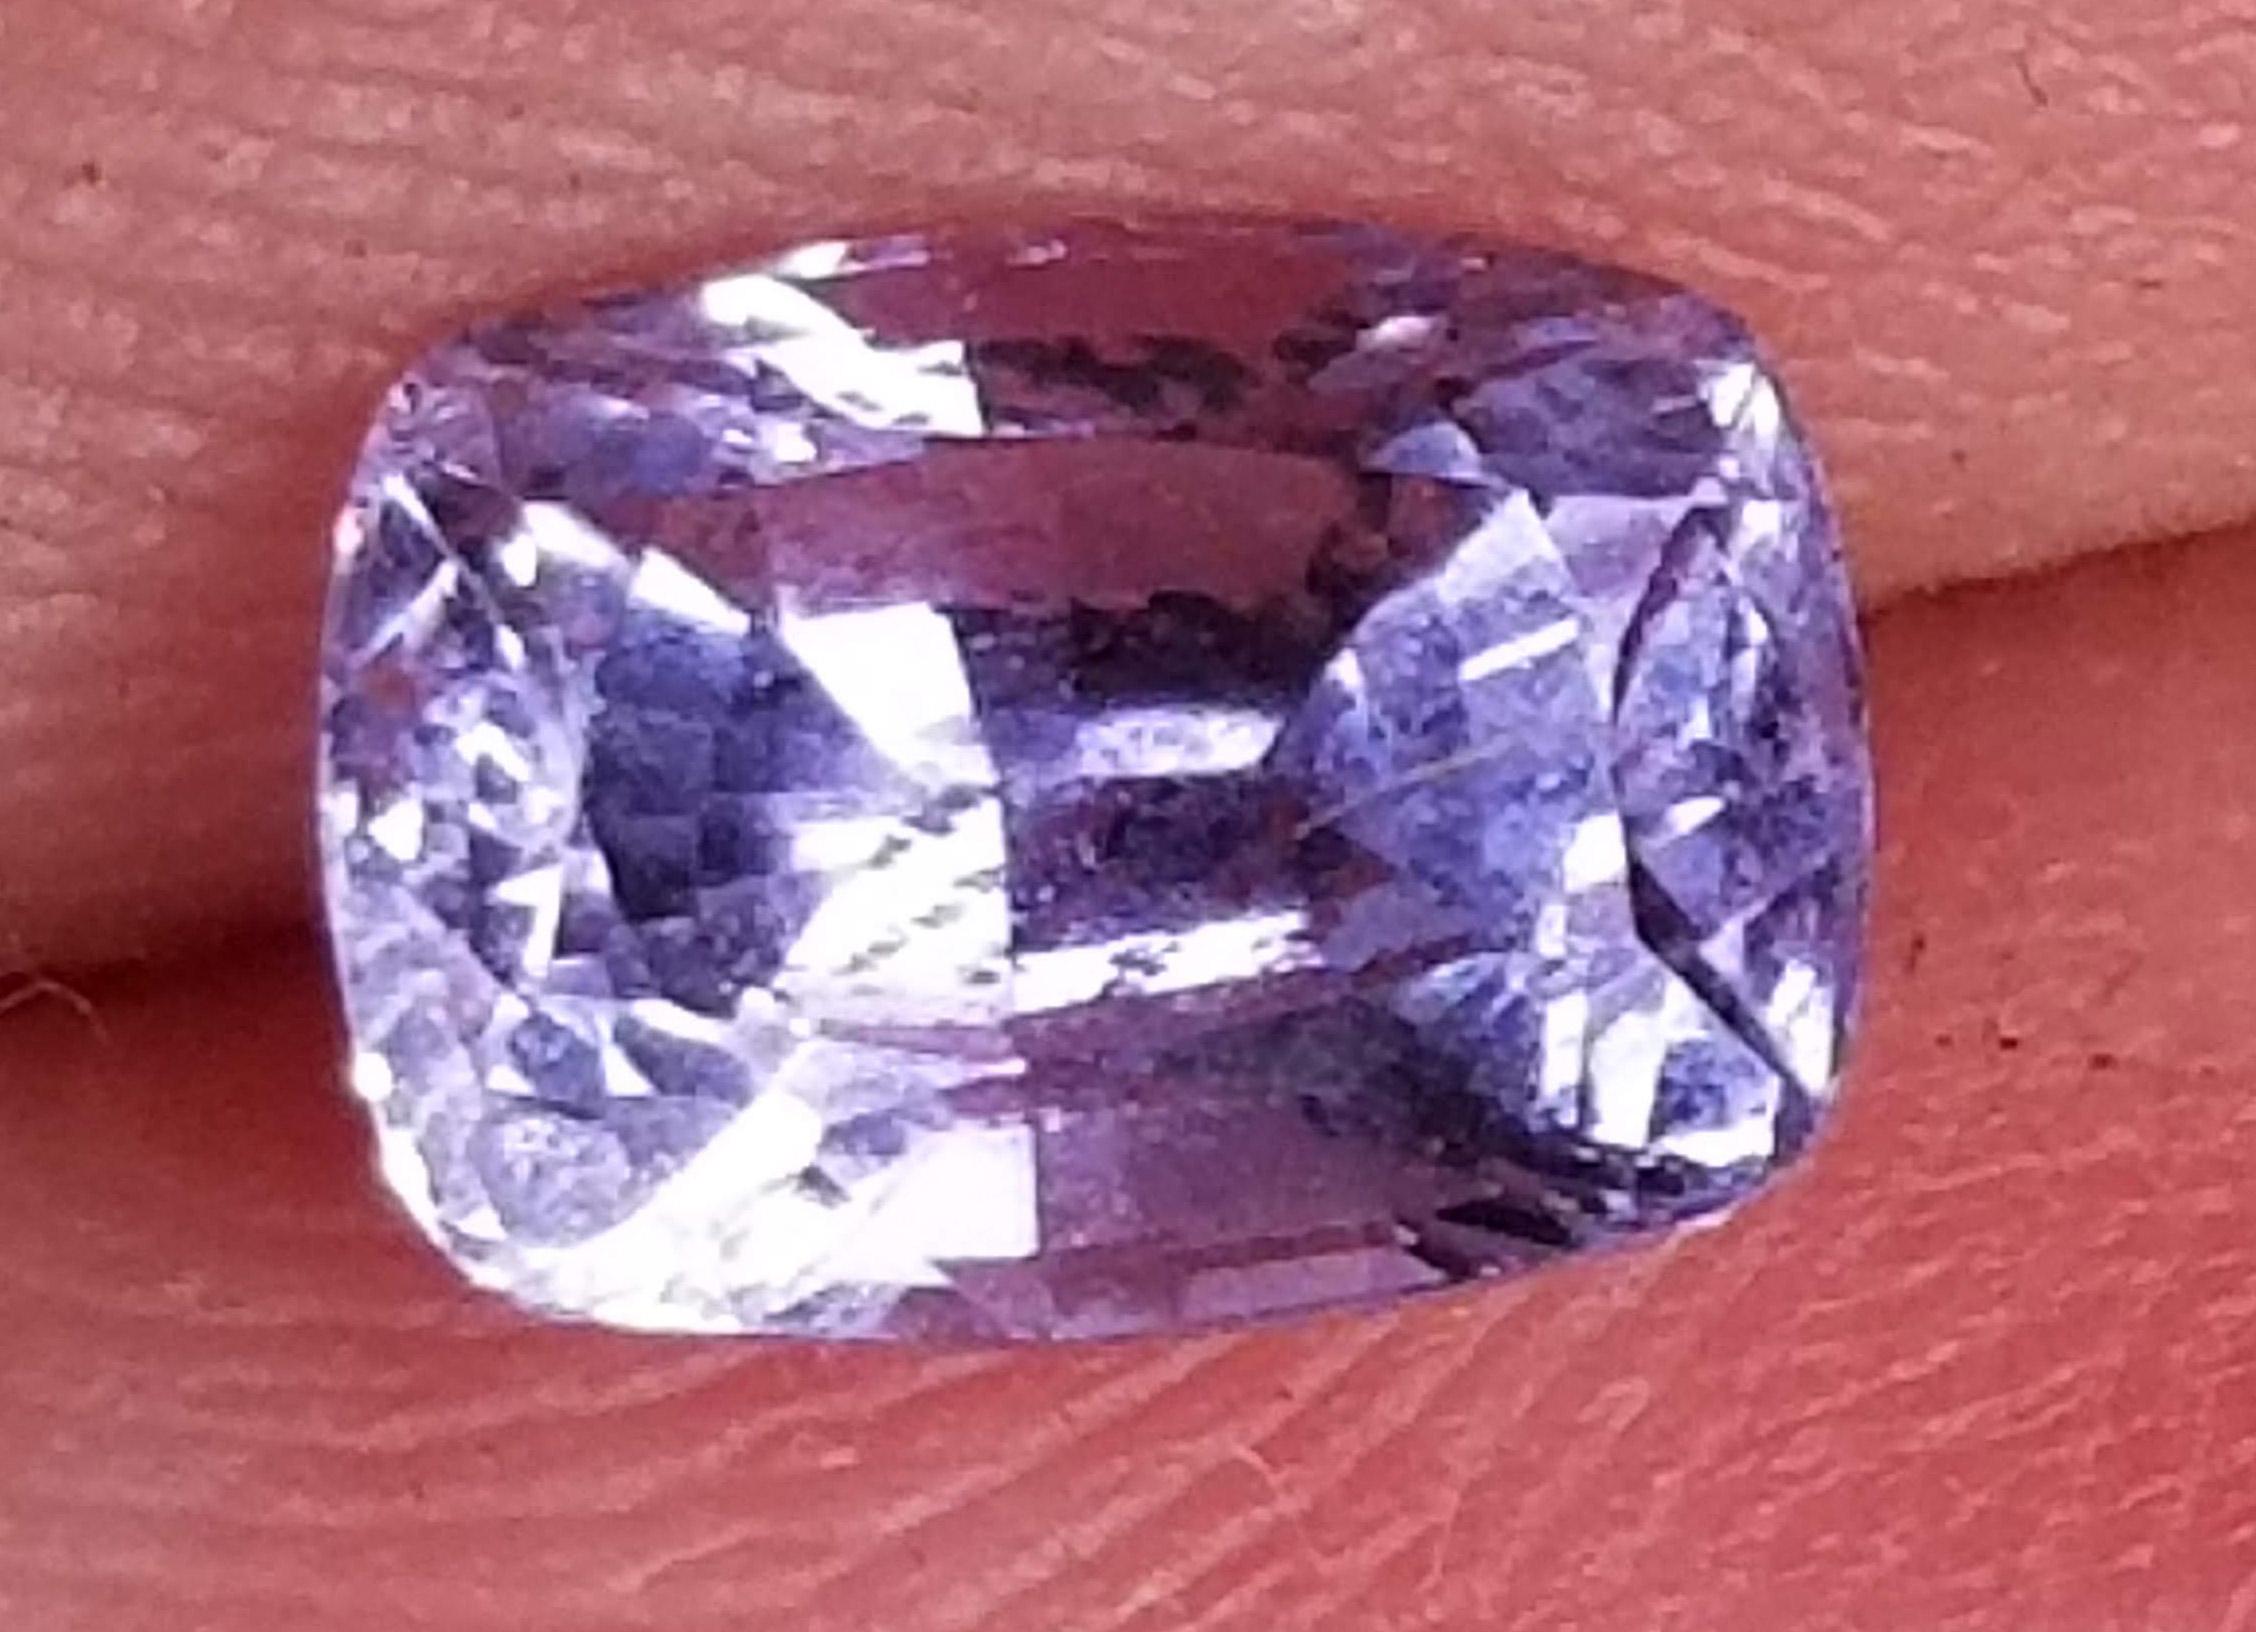 Ceylon Cushion Cut Violet Sapphire - 1.39 cts - 6.6x4.9mm